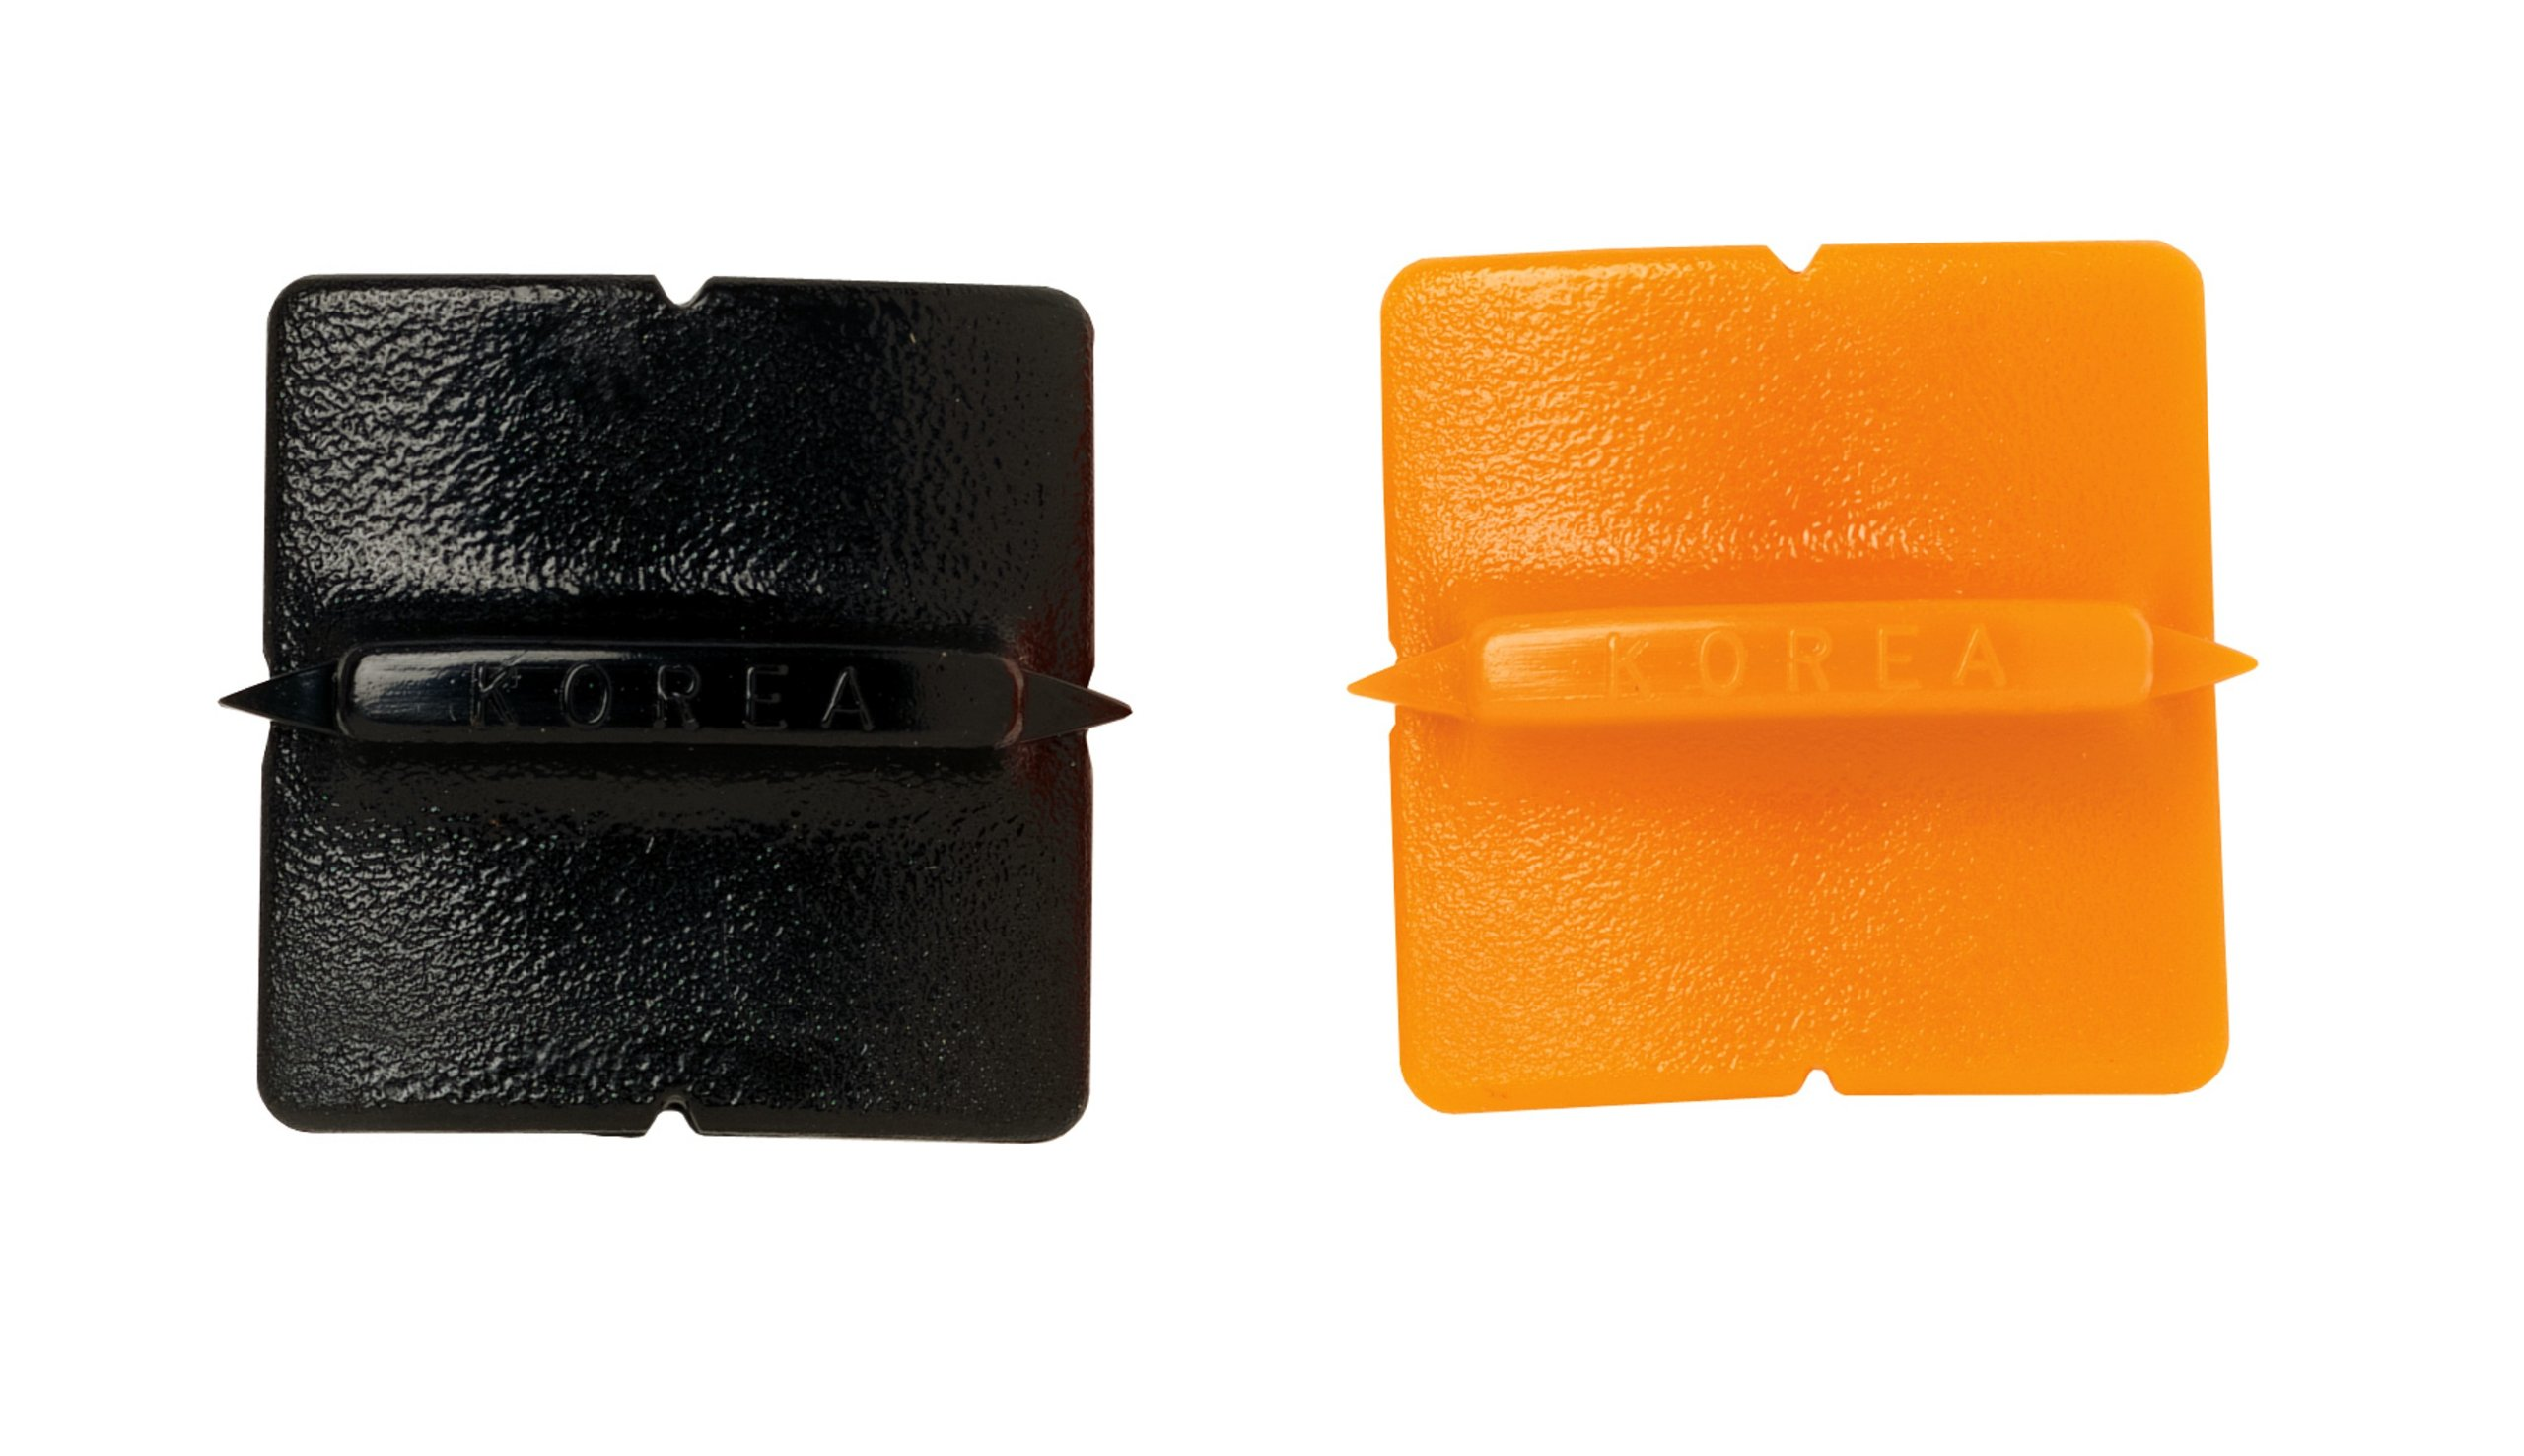 Fiskars Trimmer Replacement Blades Cut/Score, Style G (195990-1001) by Fiskars